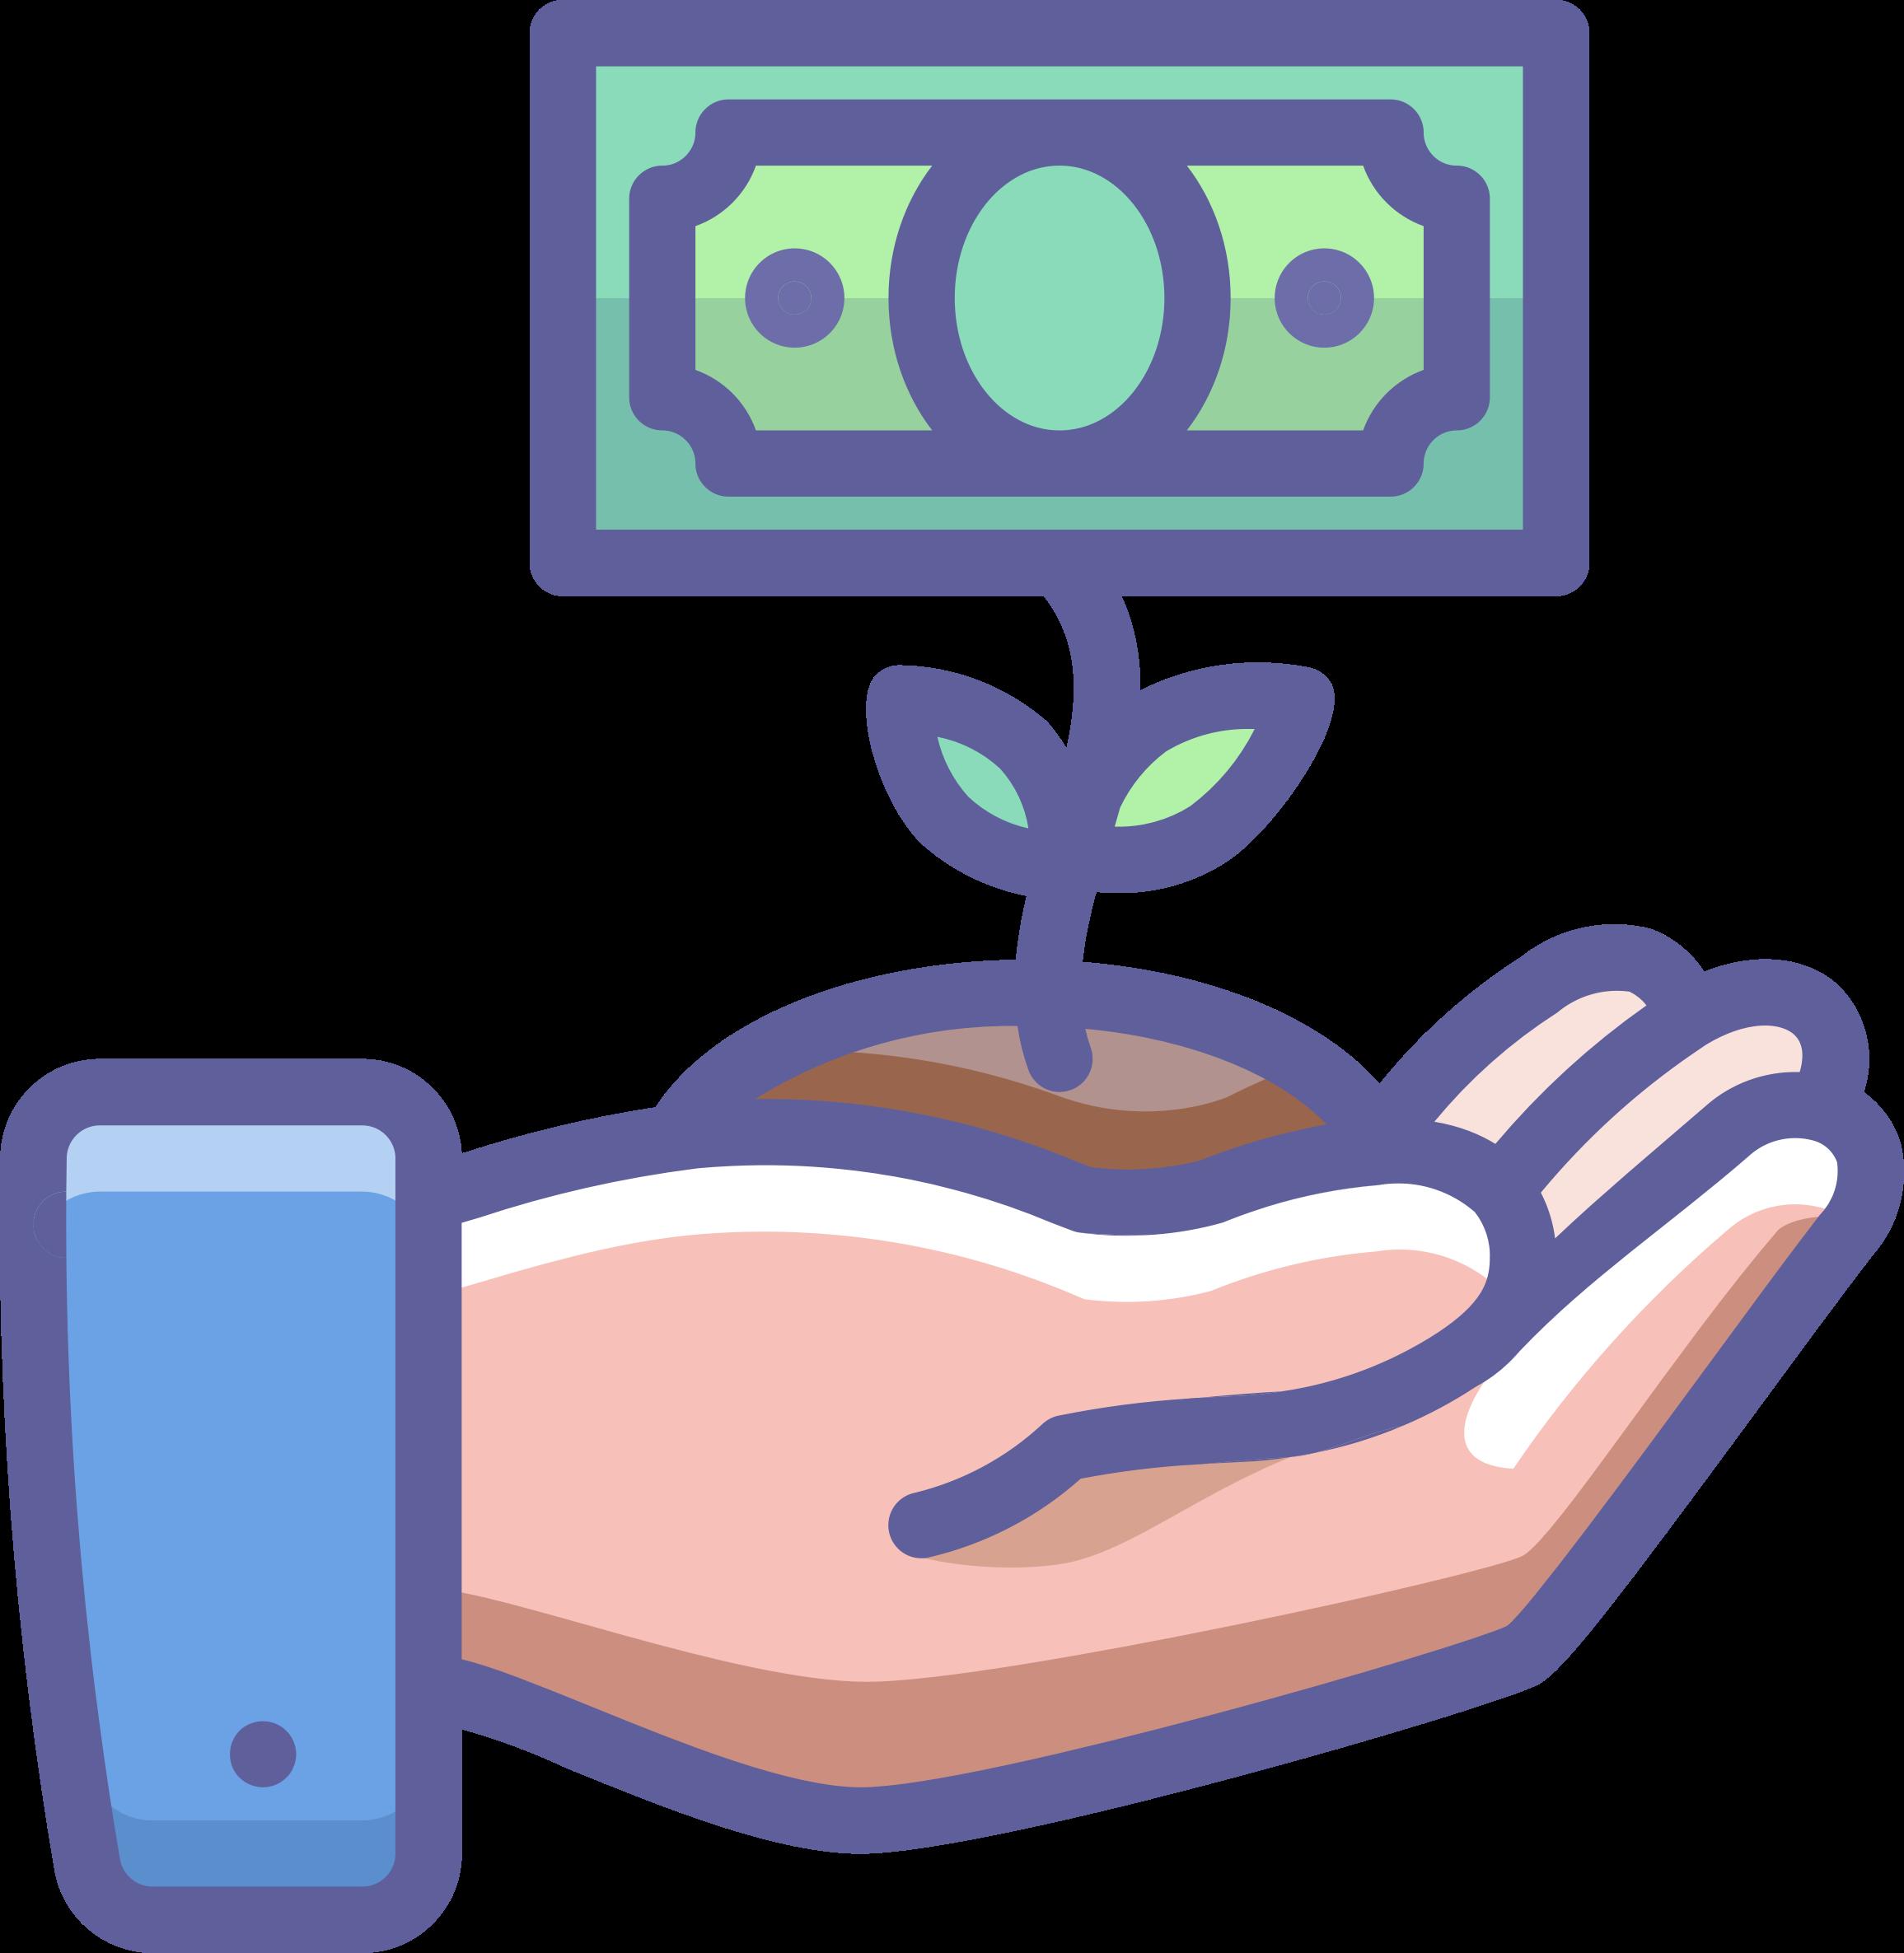 Computer clipart money. Grow ur big image